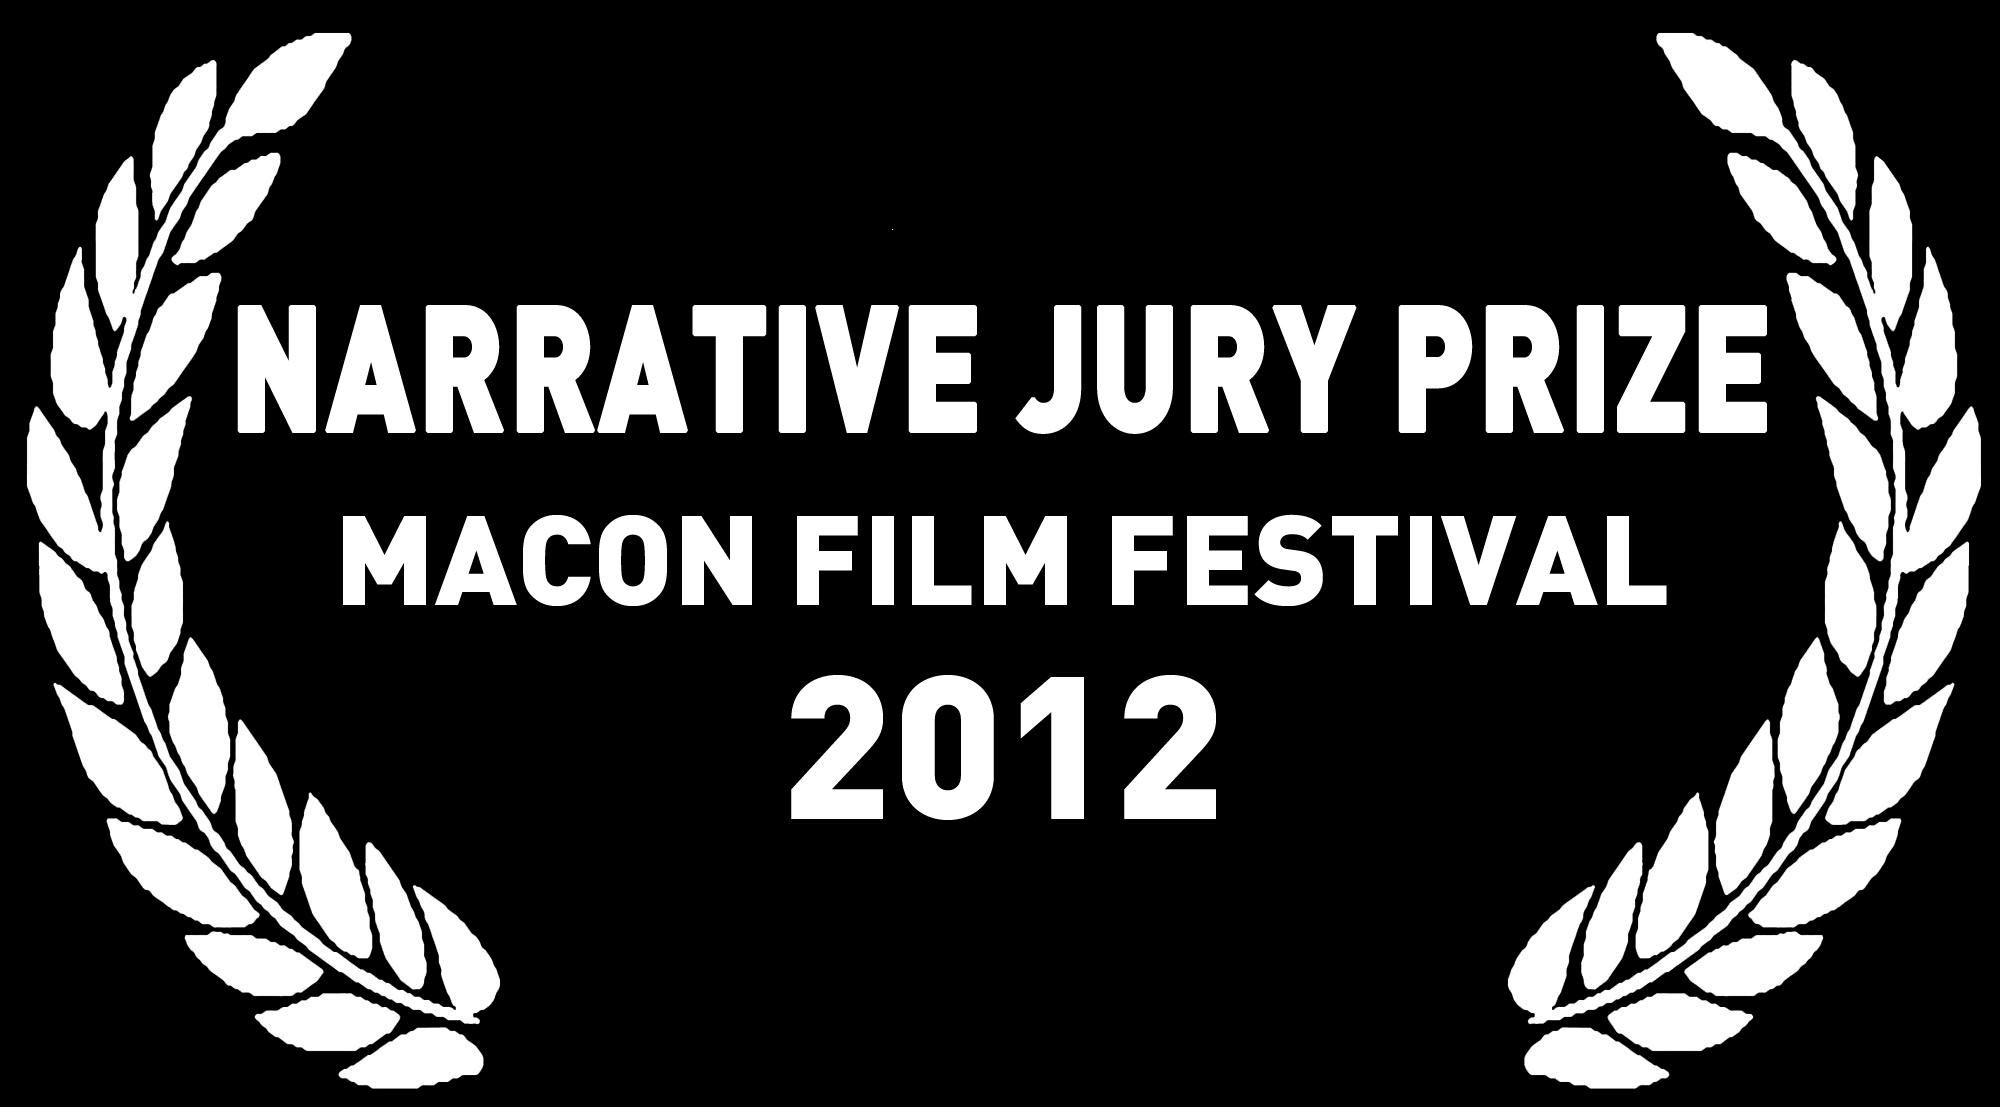 Narrative Jury Prize | Macon Film Festival